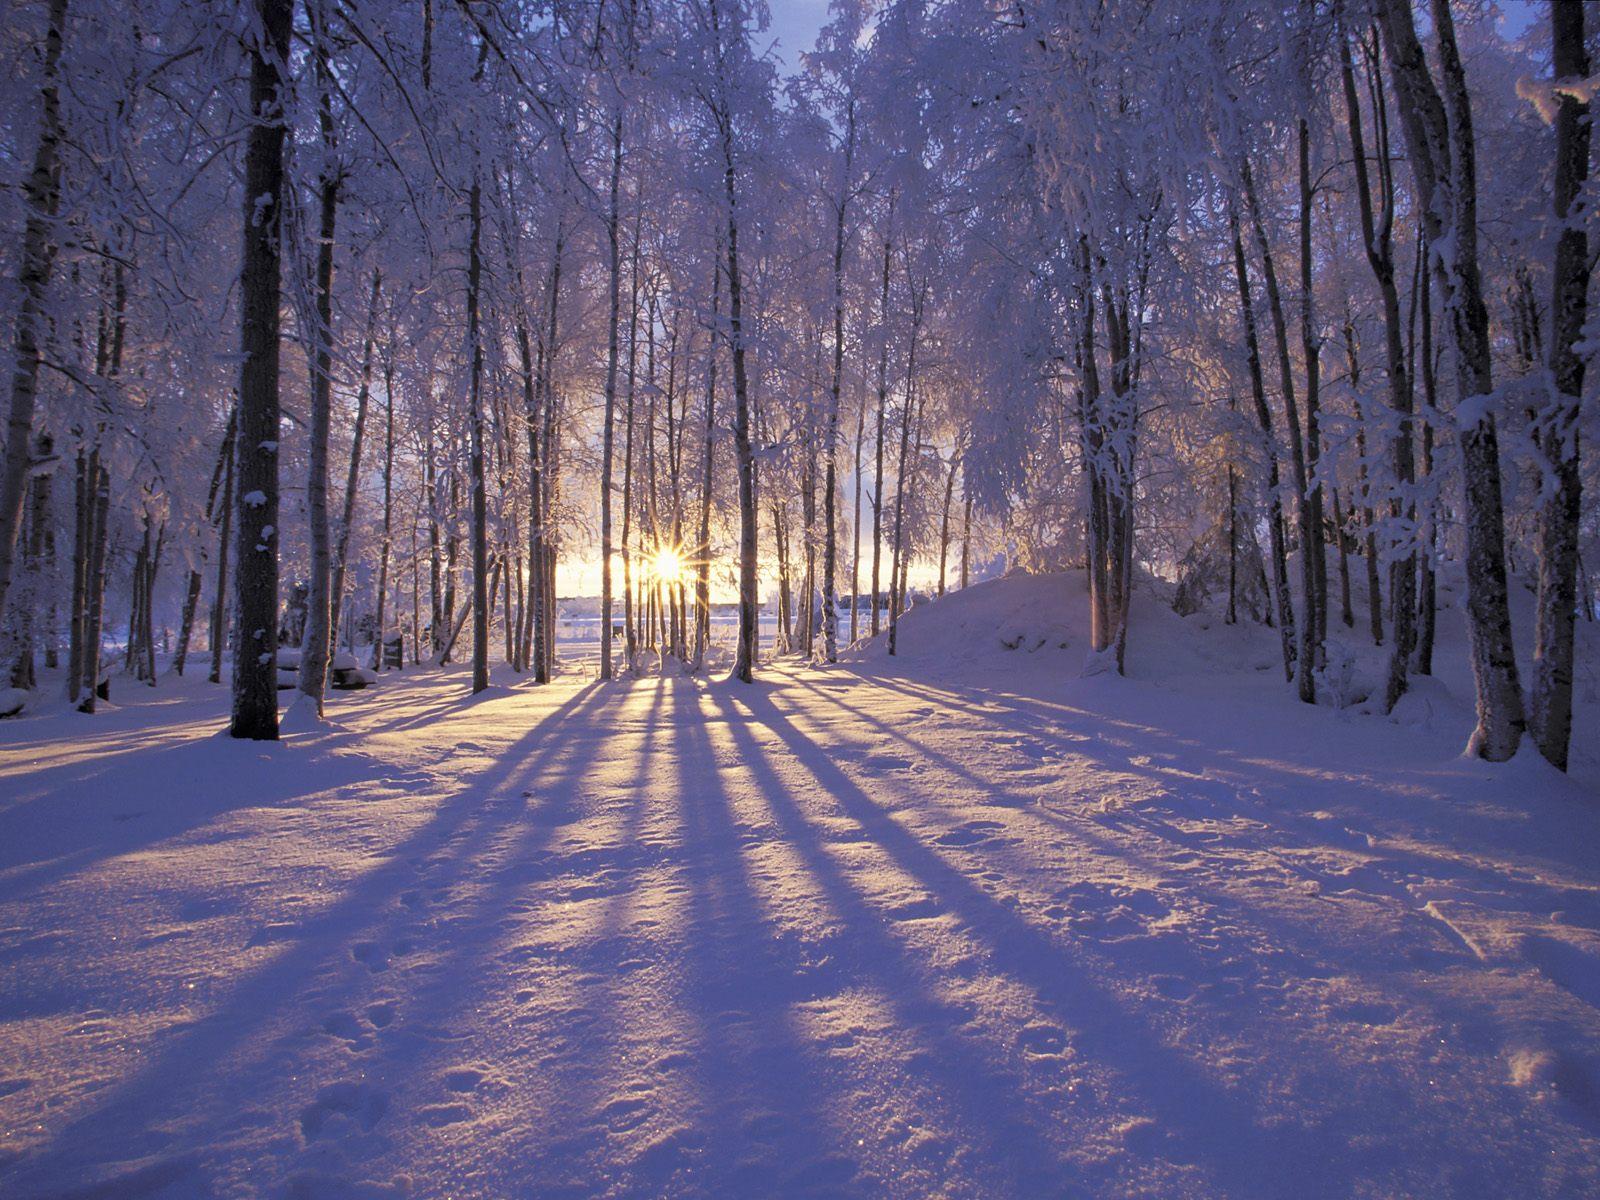 winter-Christmas-winter-wallpaper-wp4210707